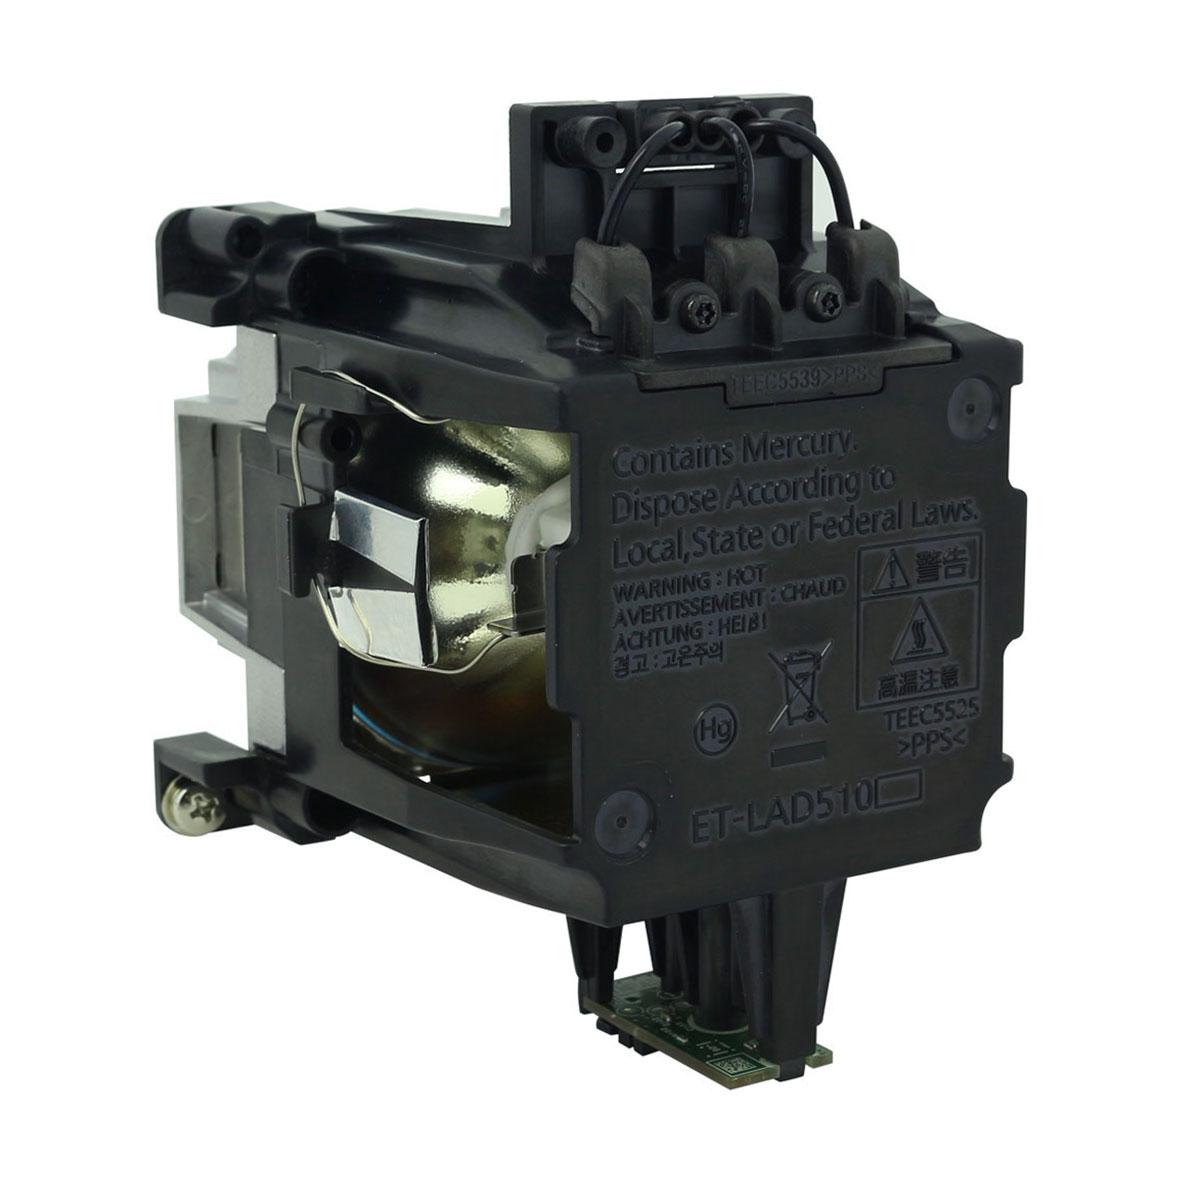 Original Ushio Projector Lamp Replacement for Panasonic PT-DW17K (Bulb Only) - image 2 de 5